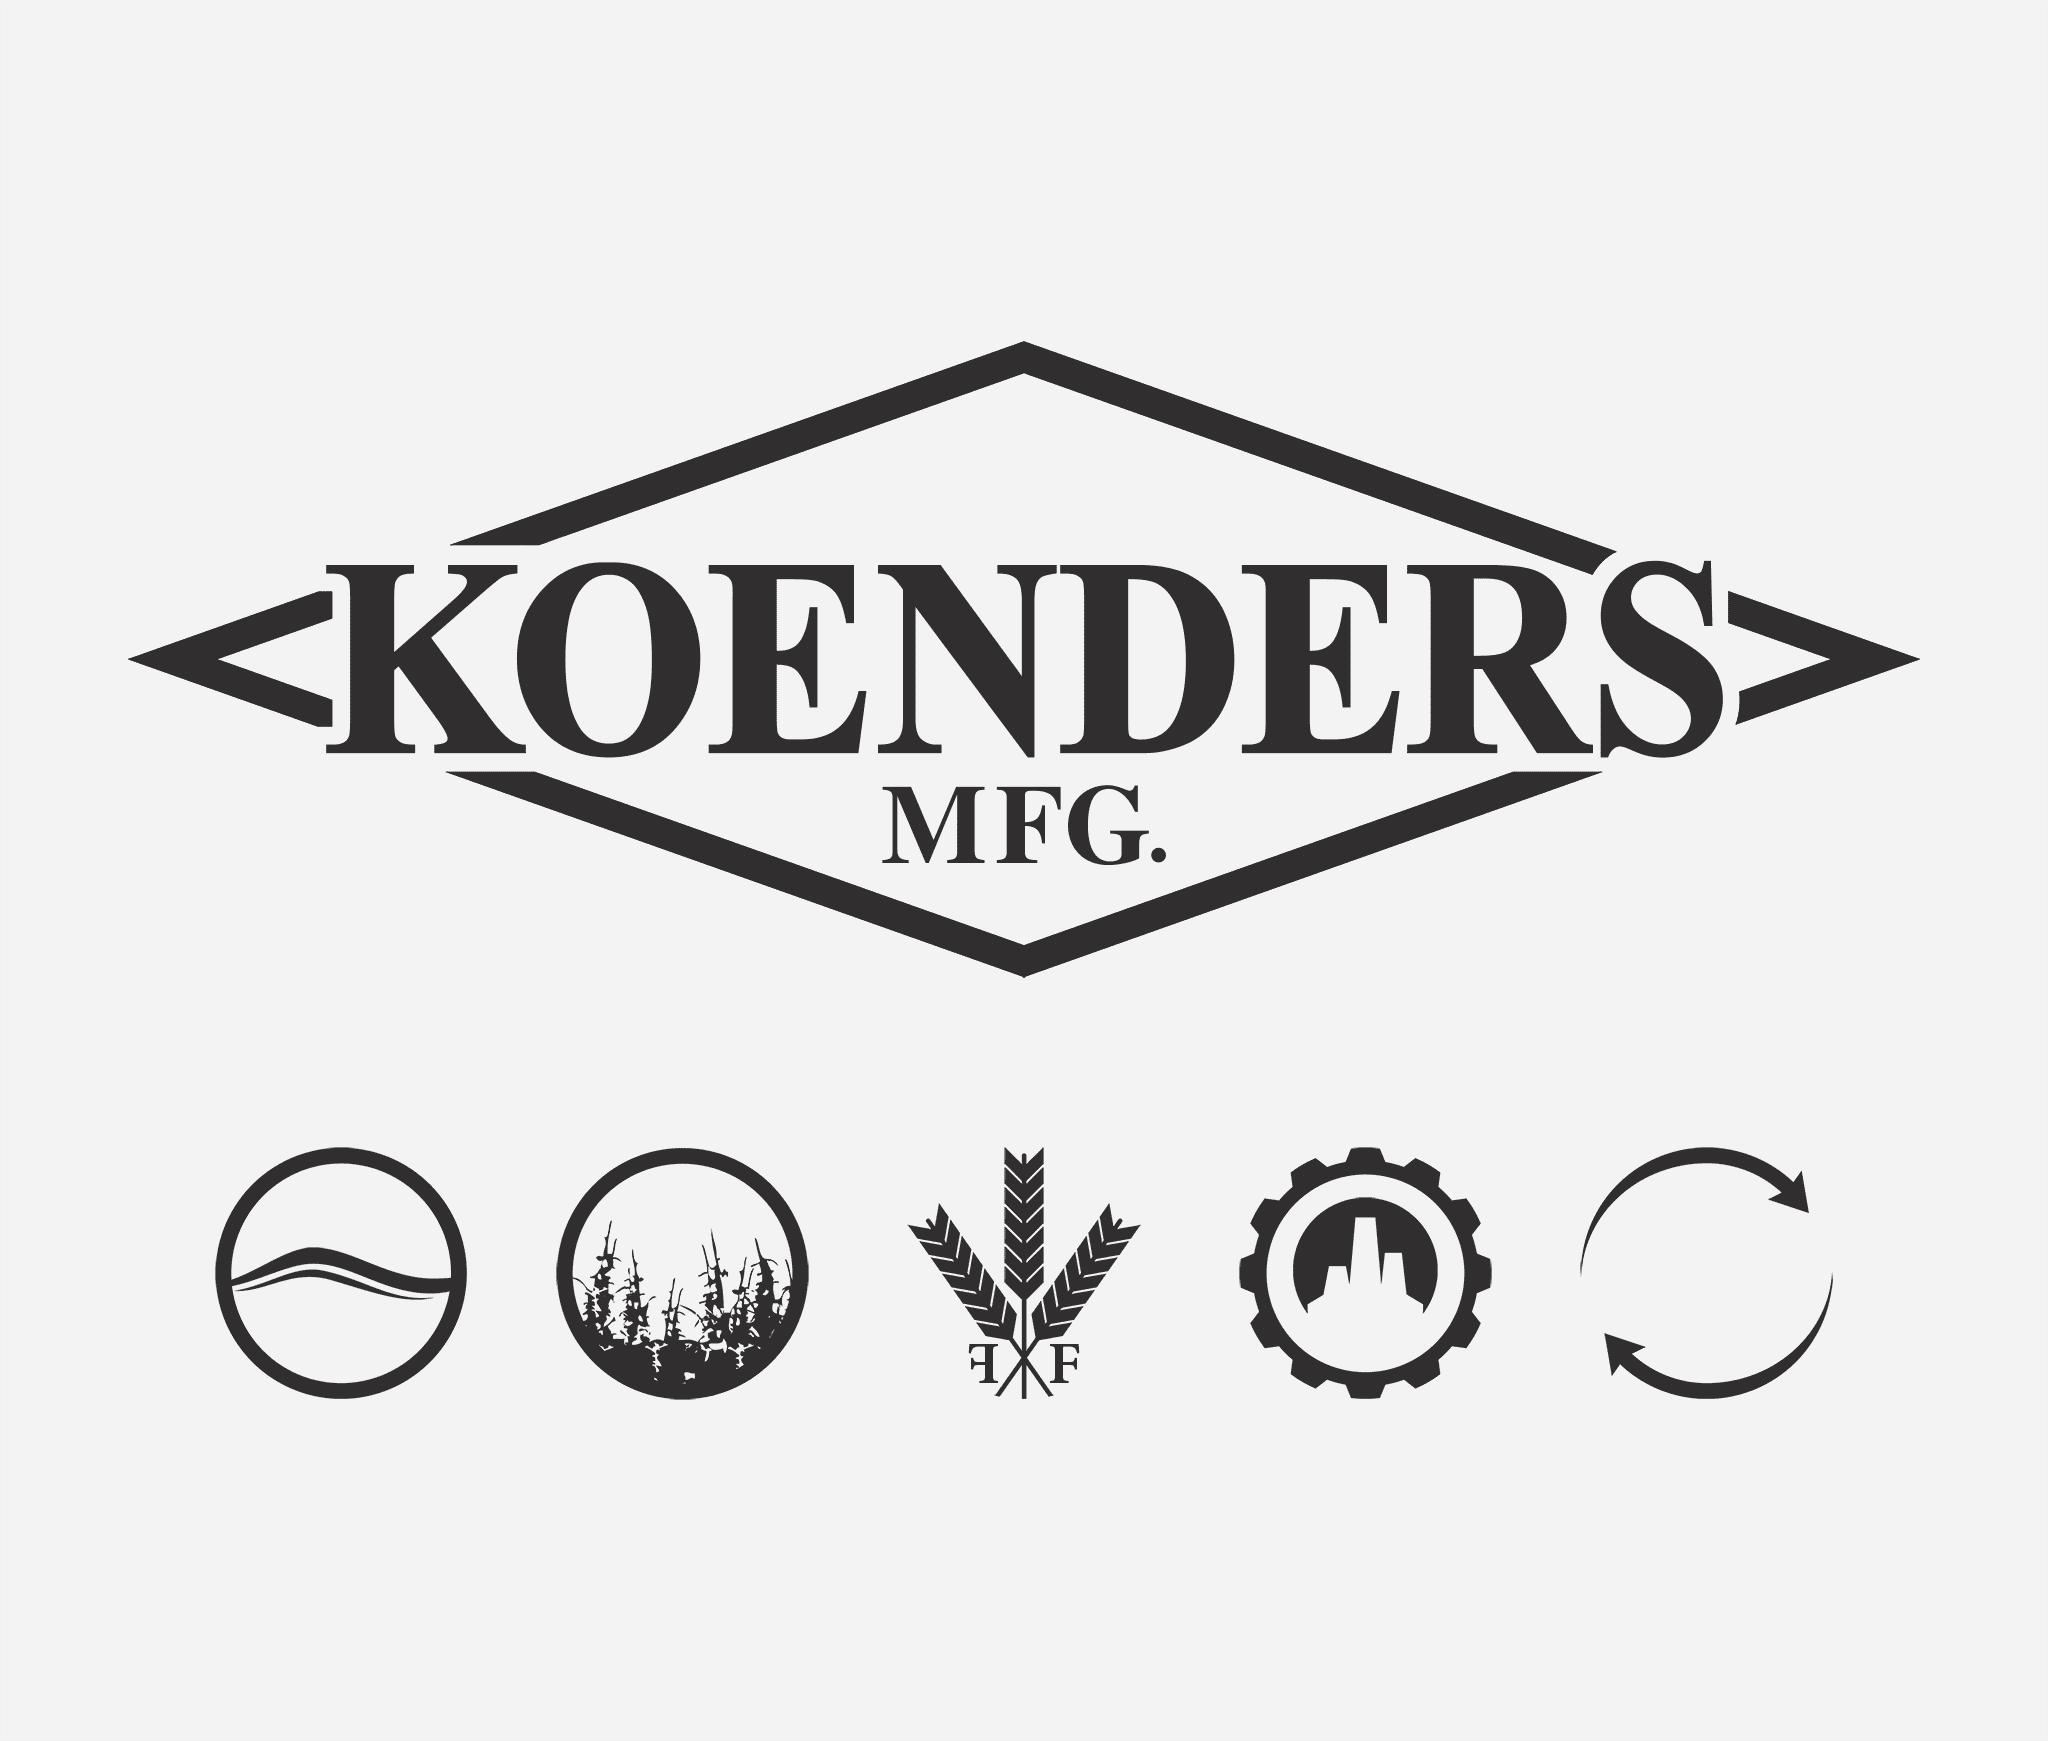 Koenders Main Logo and Product Line Logos